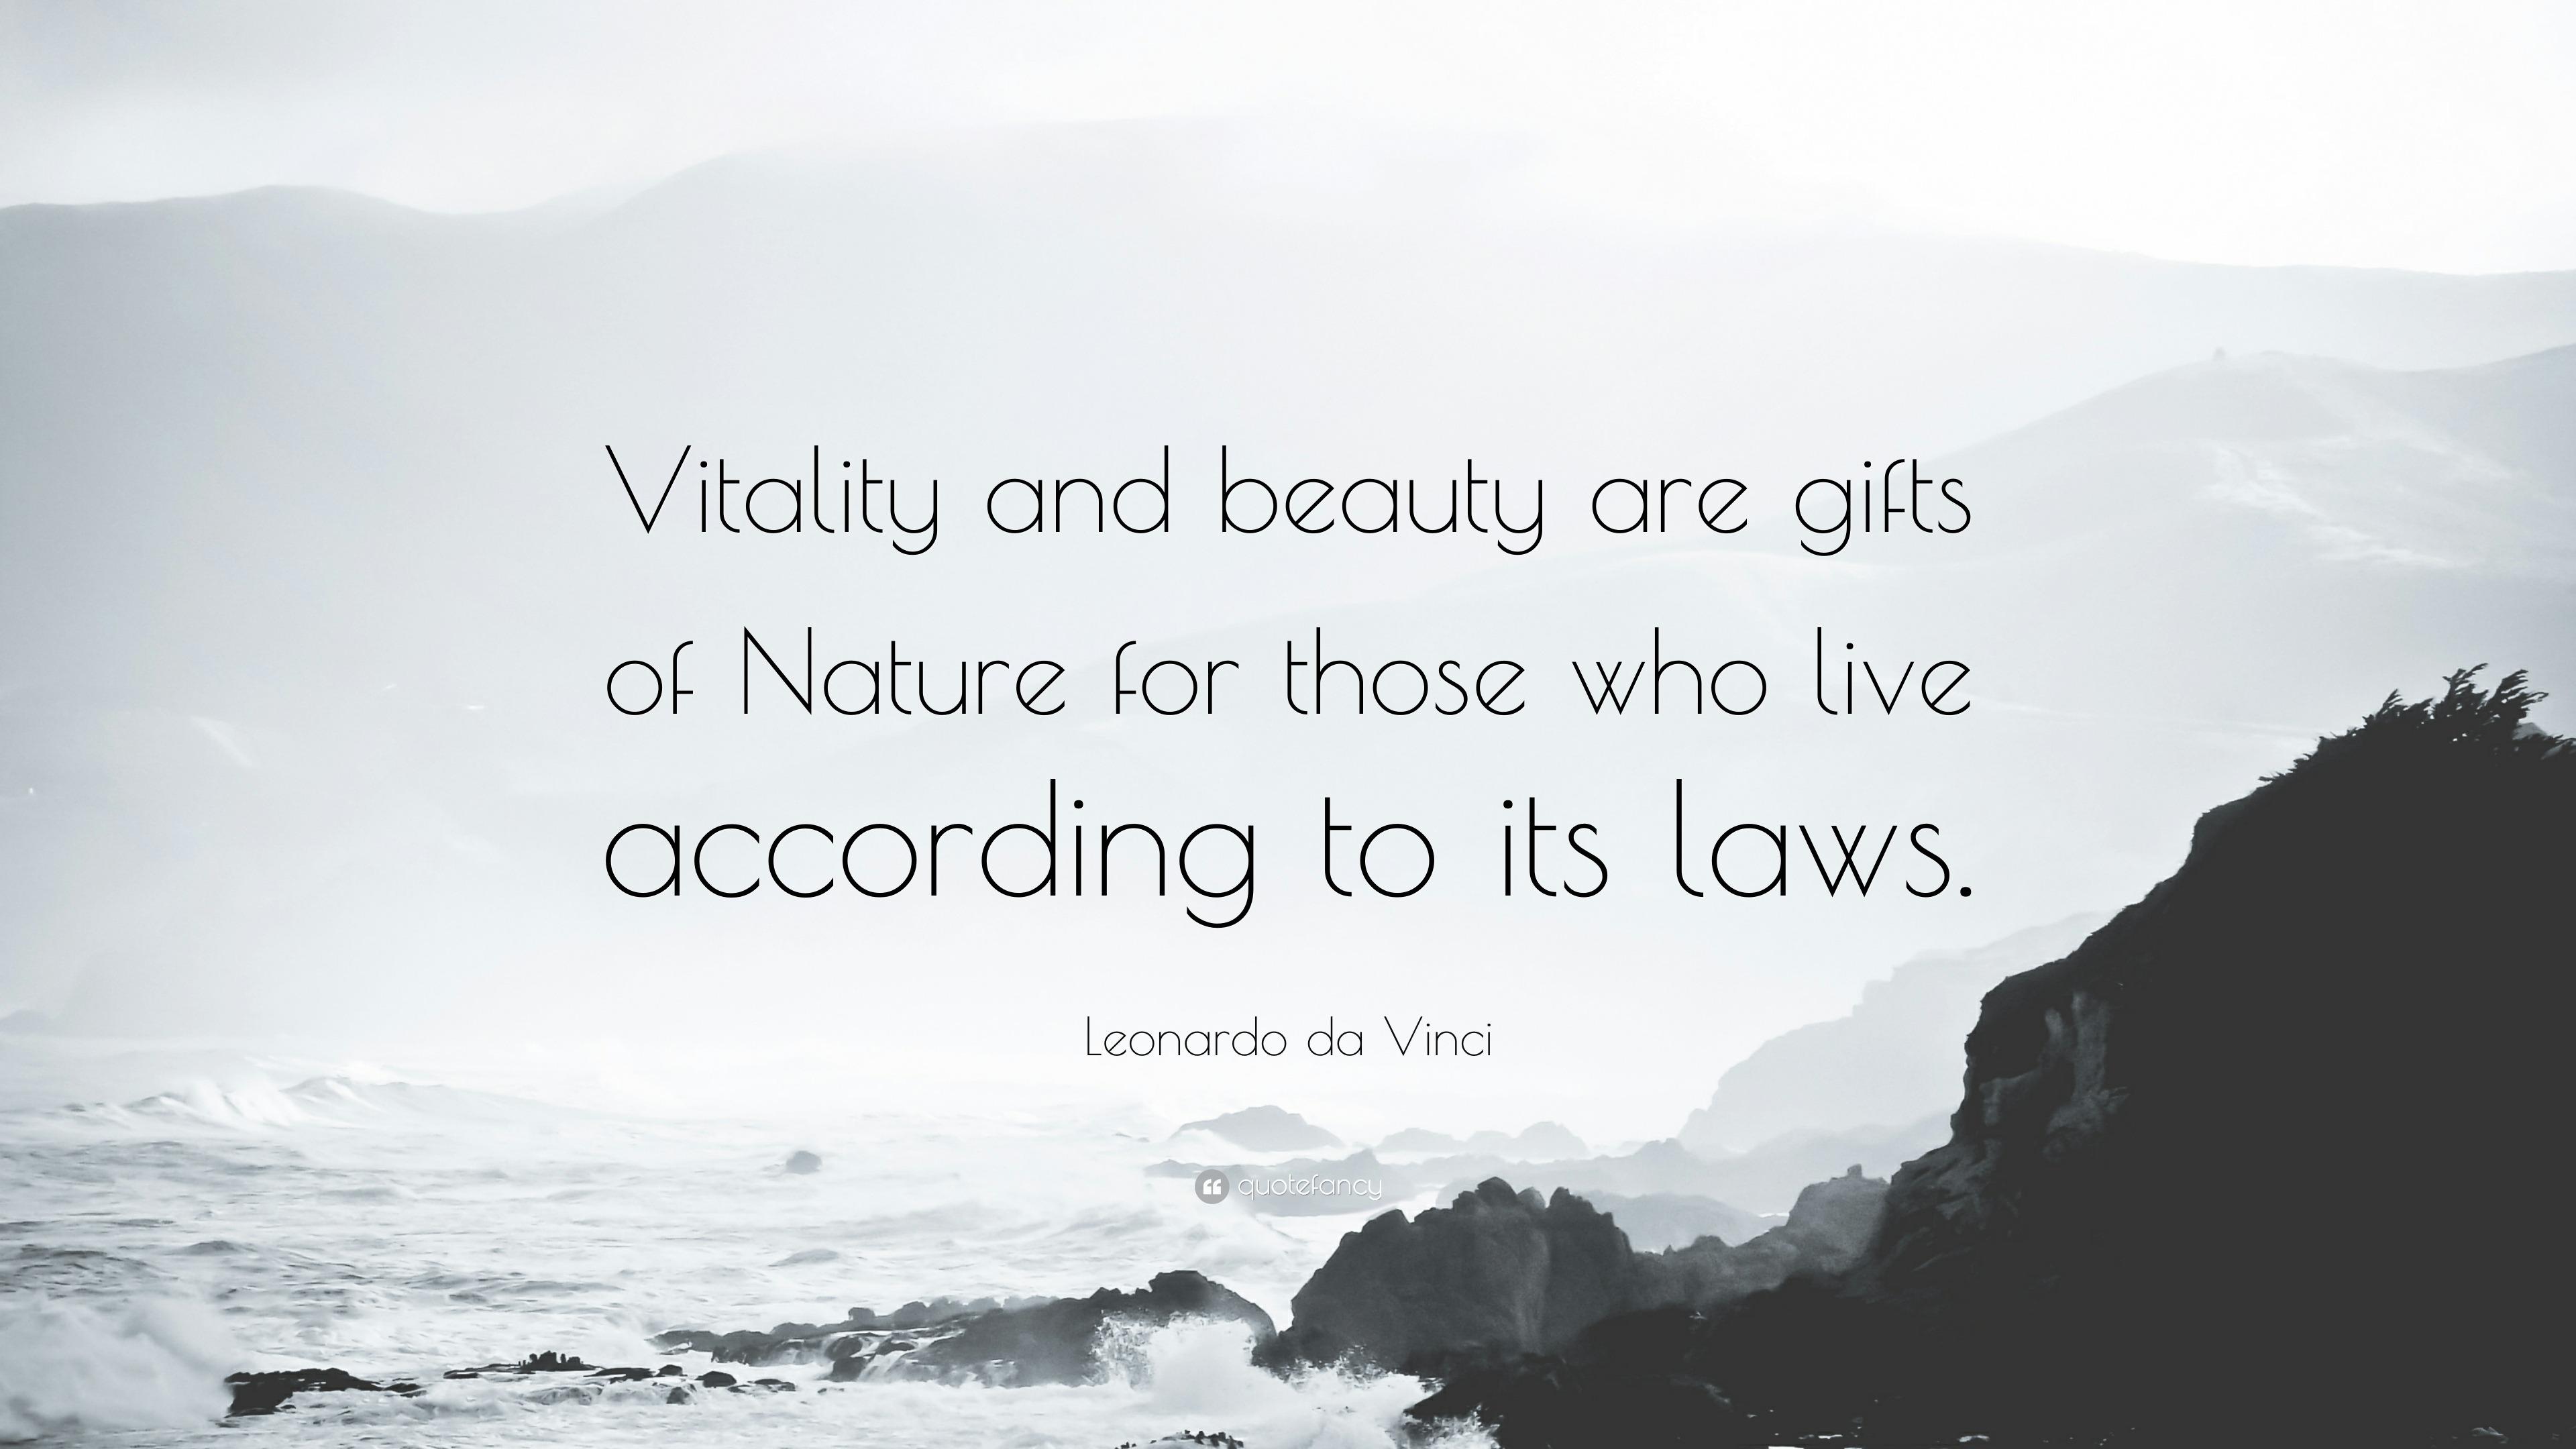 Leonardo Da Vinci Quote Vitality And Beauty Are Gifts Of Nature